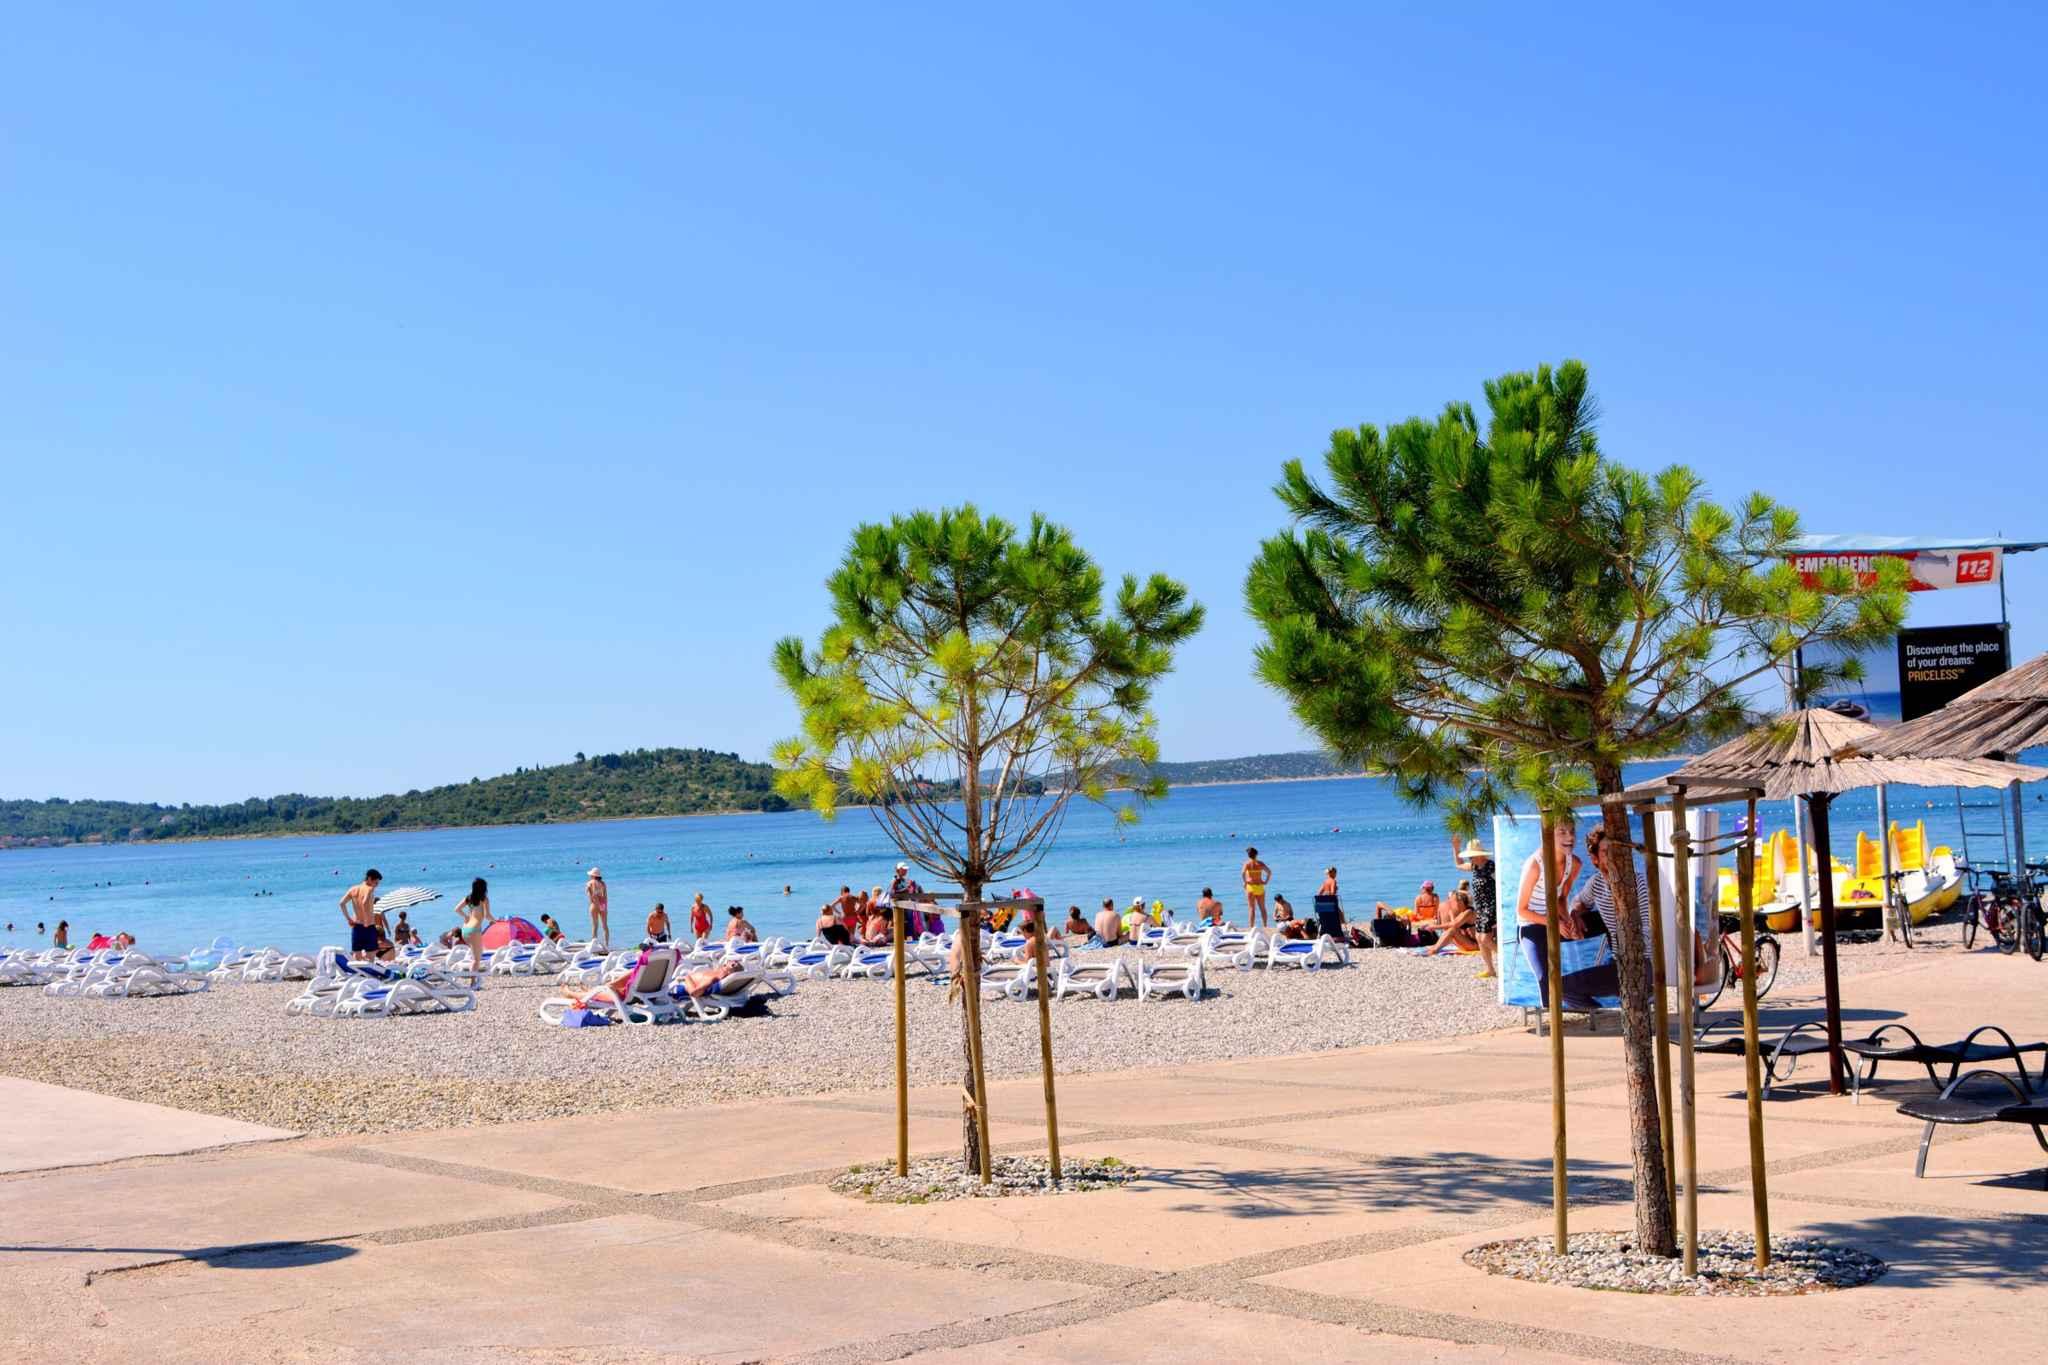 Appartement de vacances mit Terrasse (278775), Vodice, , Dalmatie, Croatie, image 9